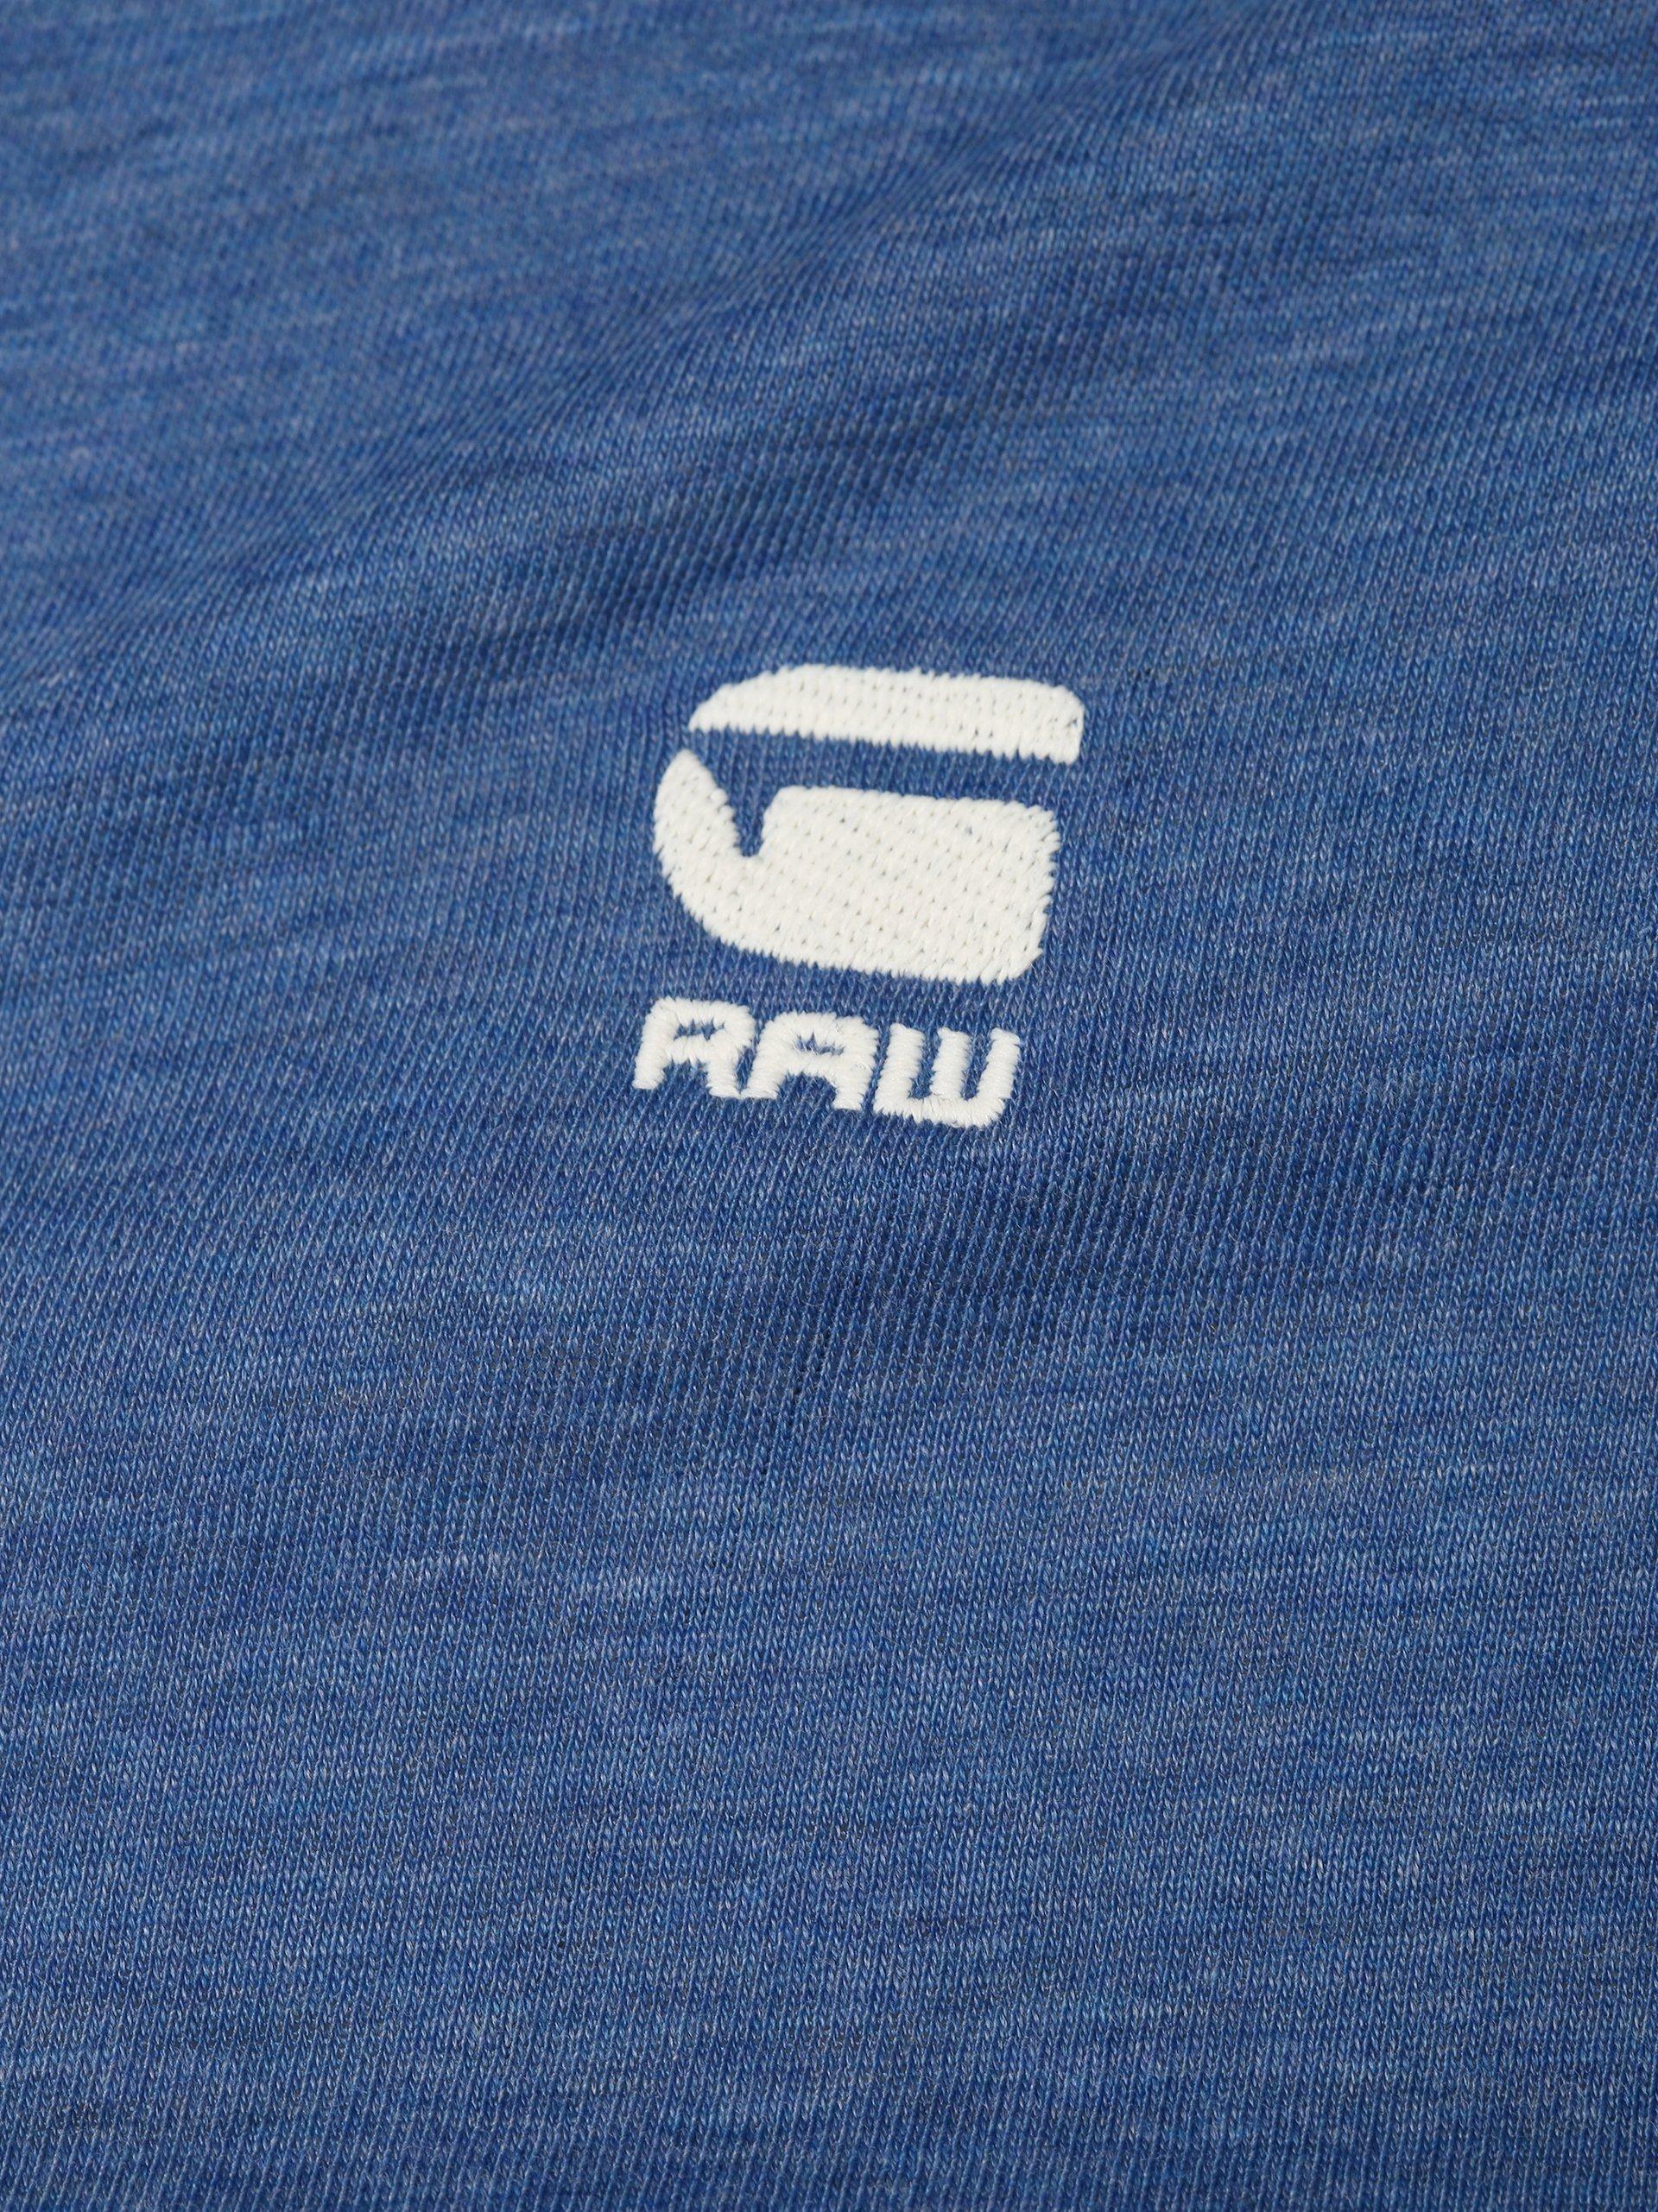 G-Star RAW T-shirt męski